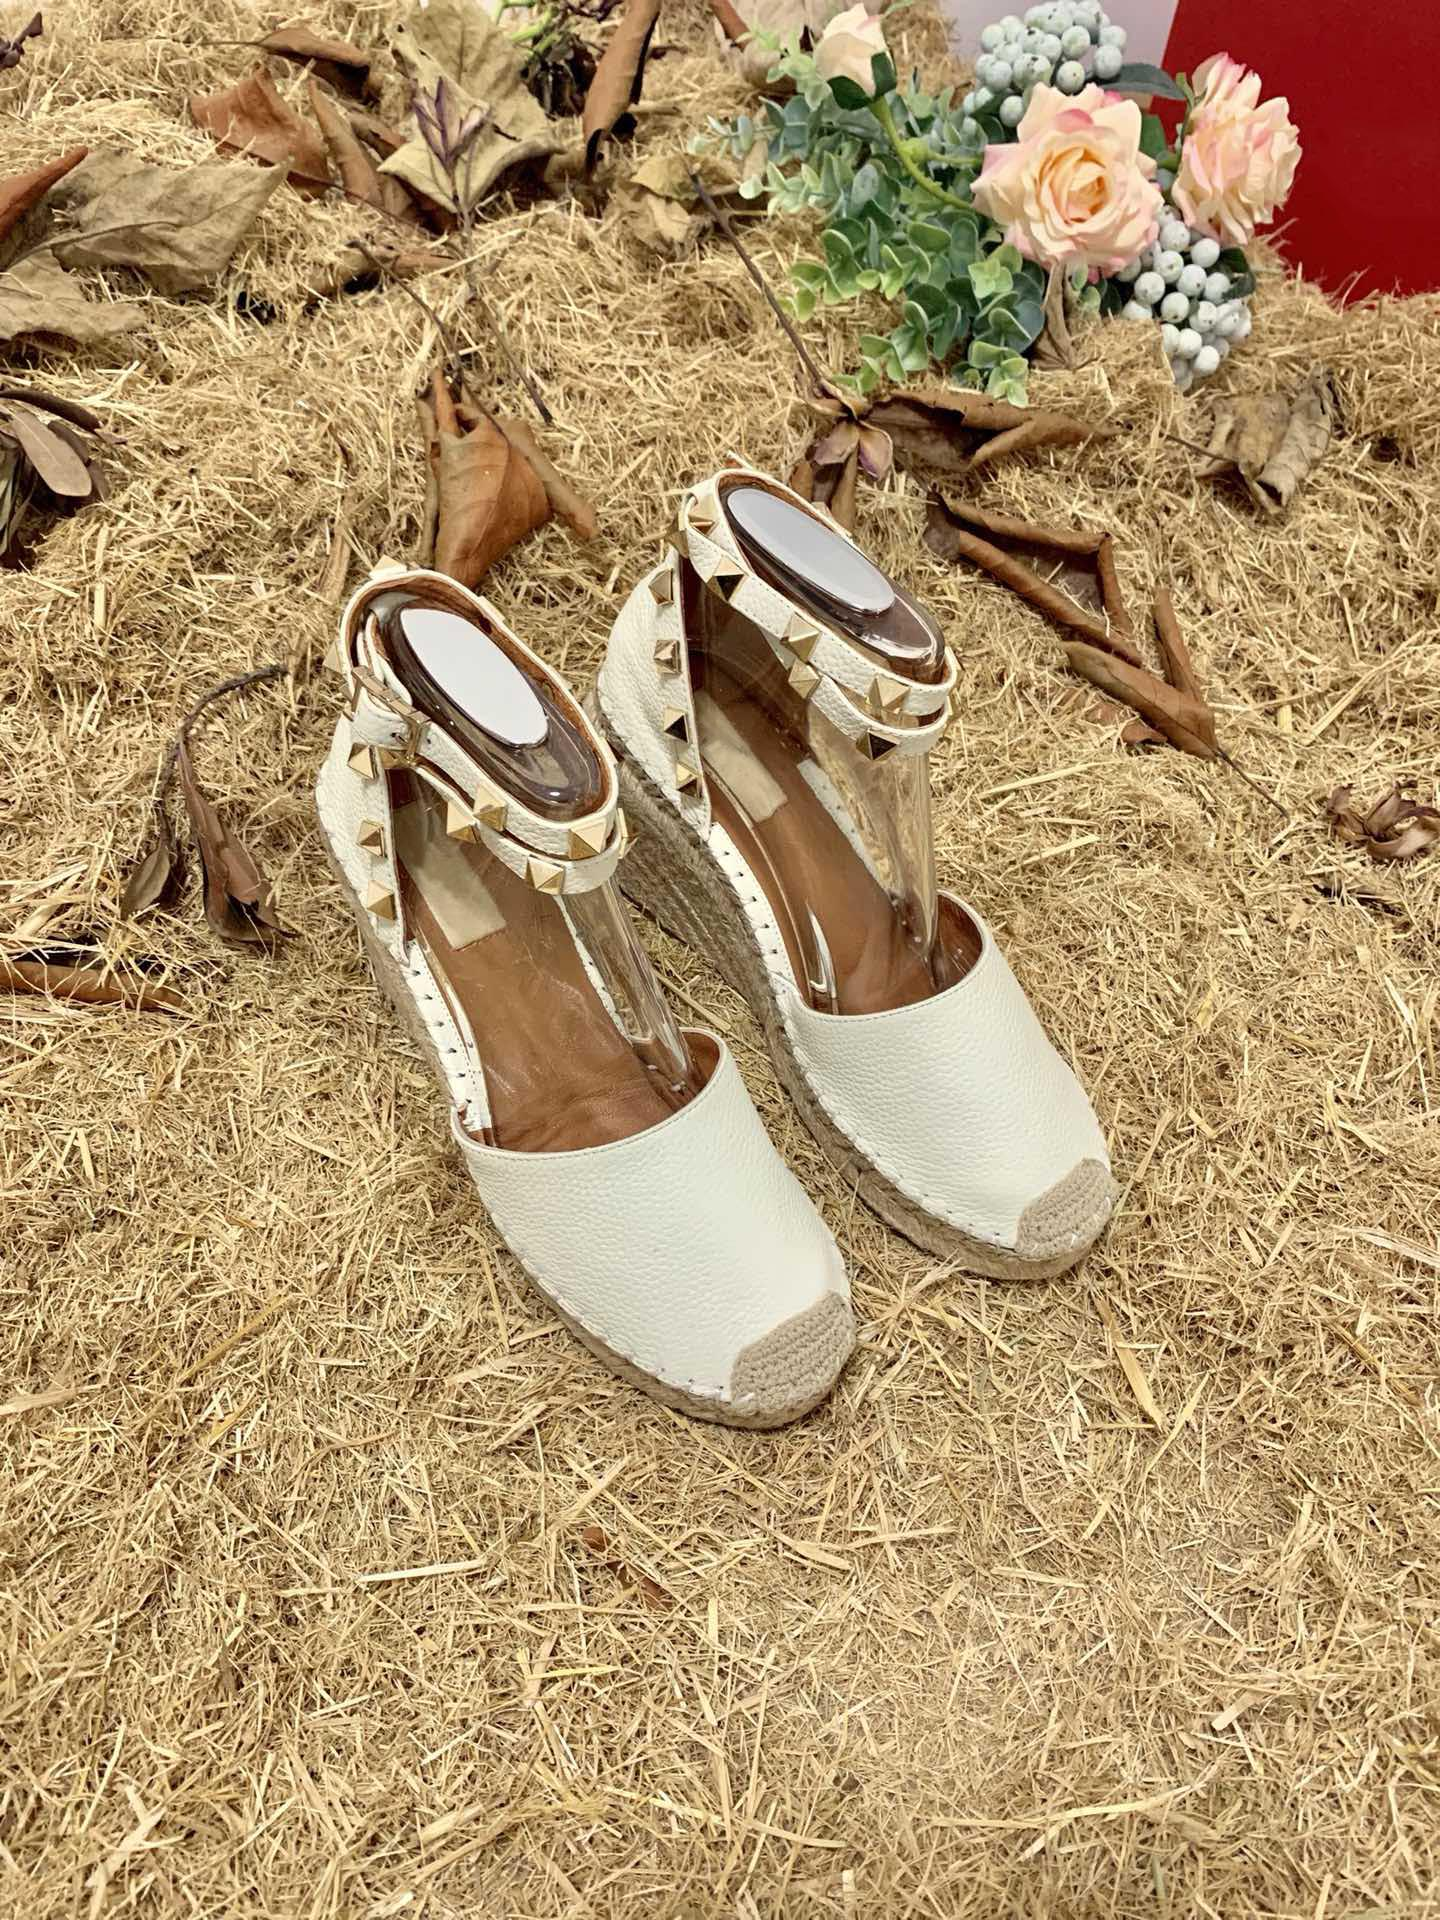 2021 luxury designer wedge sandals fashion straw shoes platform fisherman shoes large size 40 41 with box